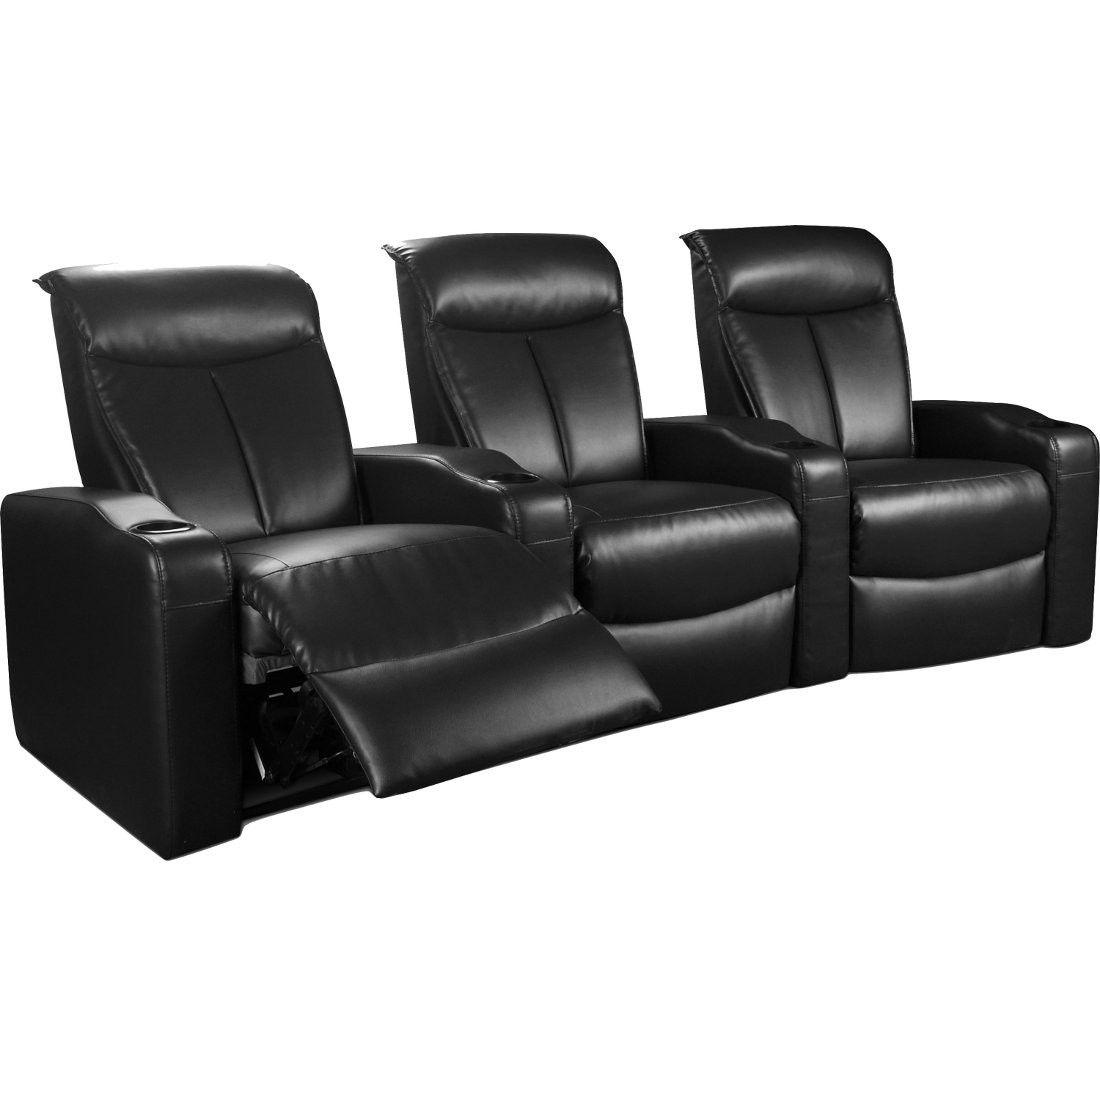 Coaster Estella Power Motion Theater Seats In Black $1,989